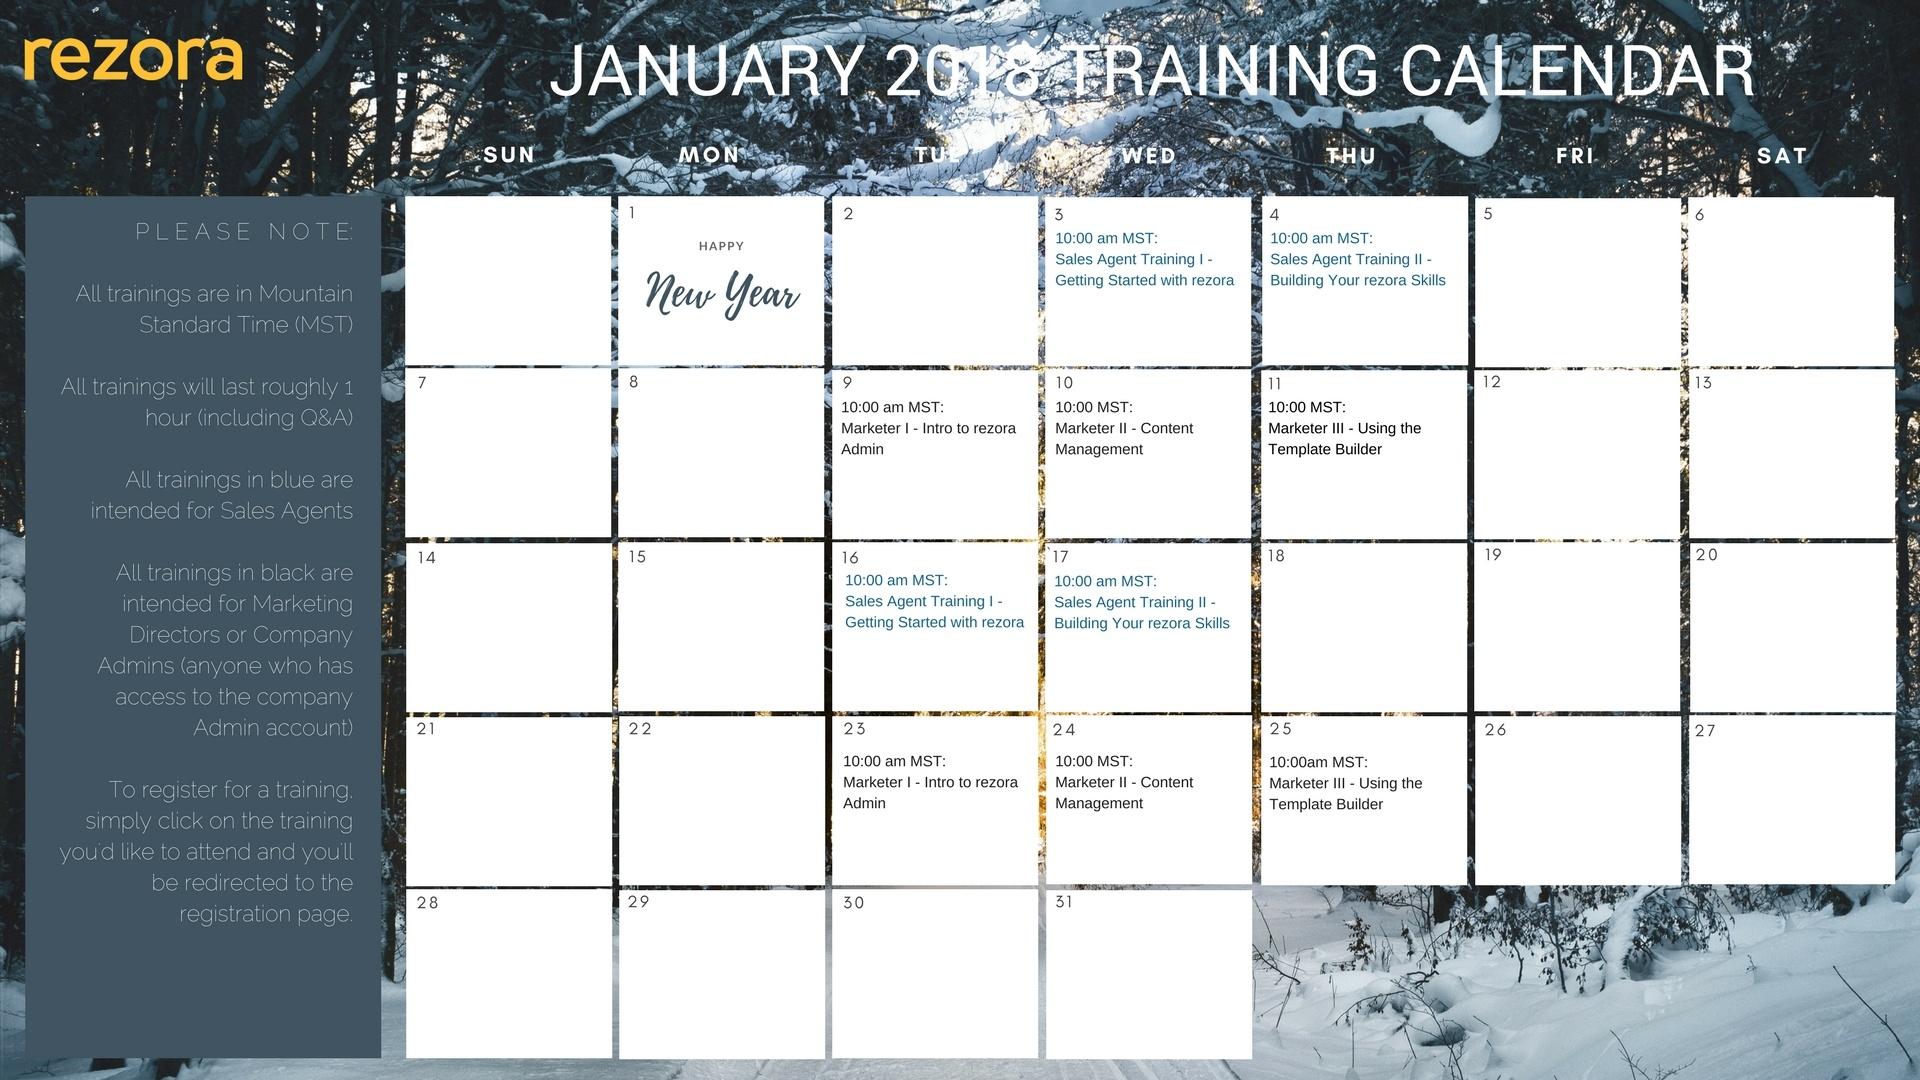 January Training Calendar.jpg